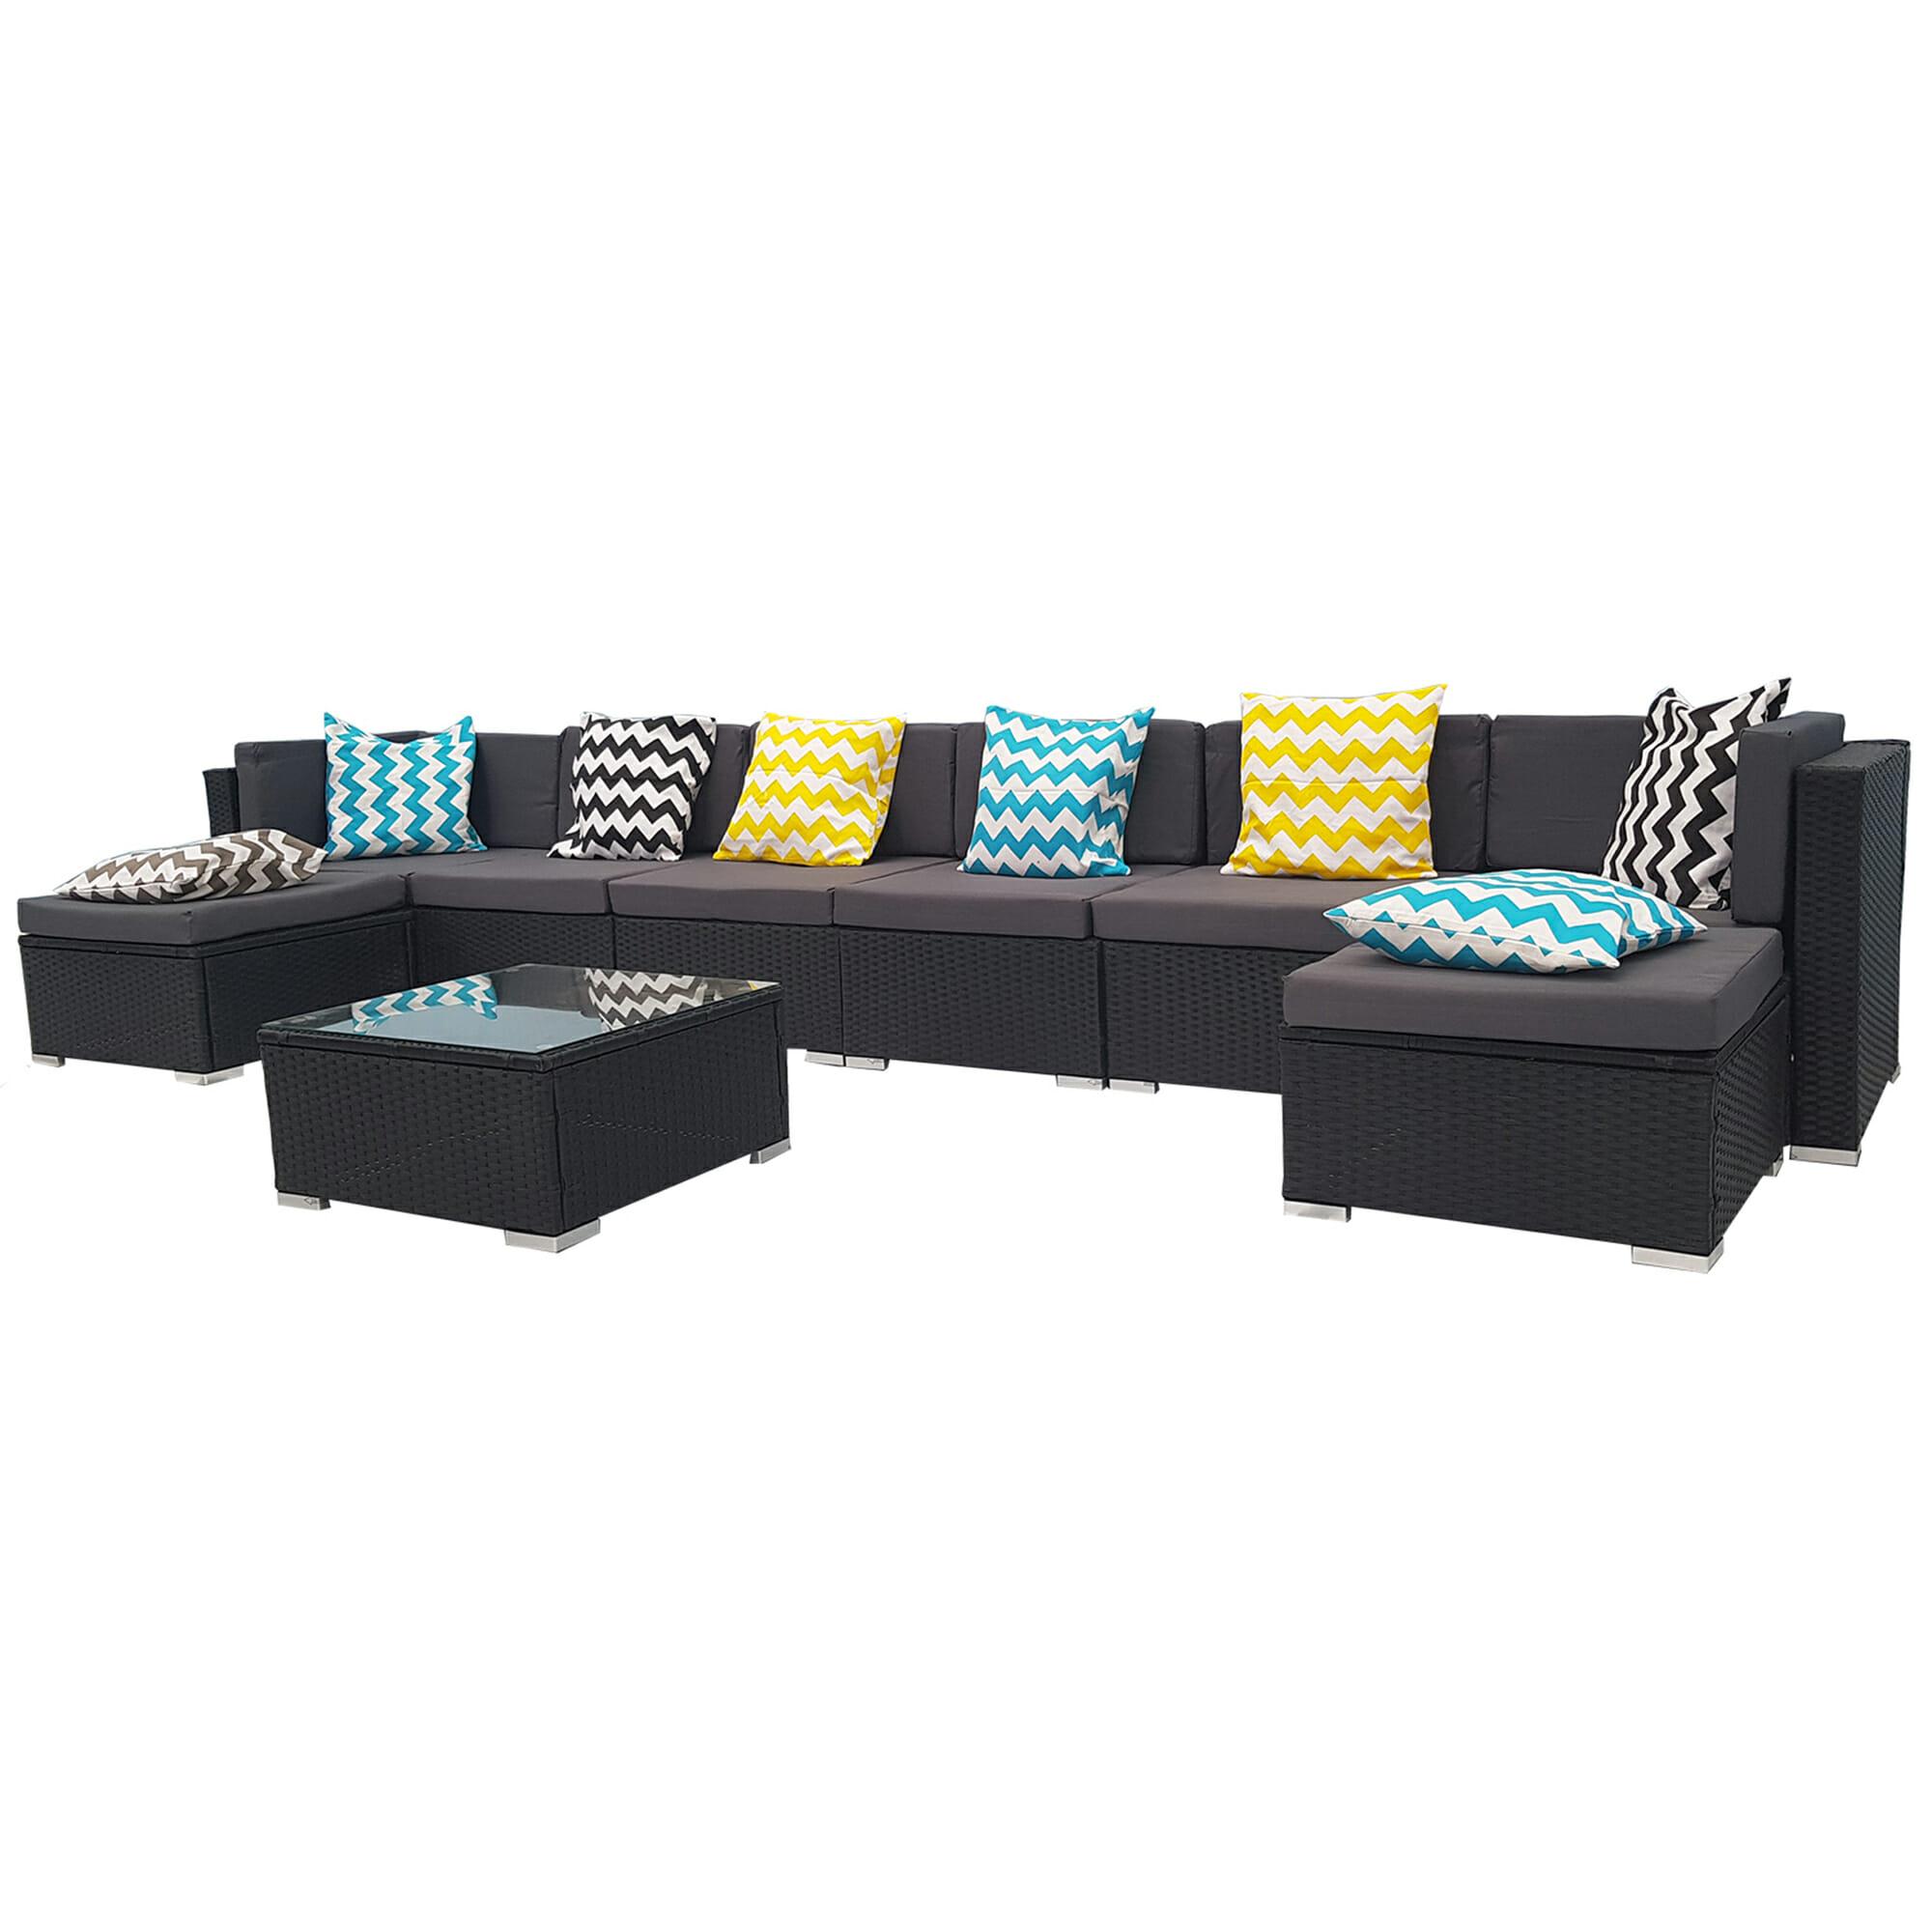 Pe Wicker: 9 Piece Wicker Outdoor PE Rattan Furniture